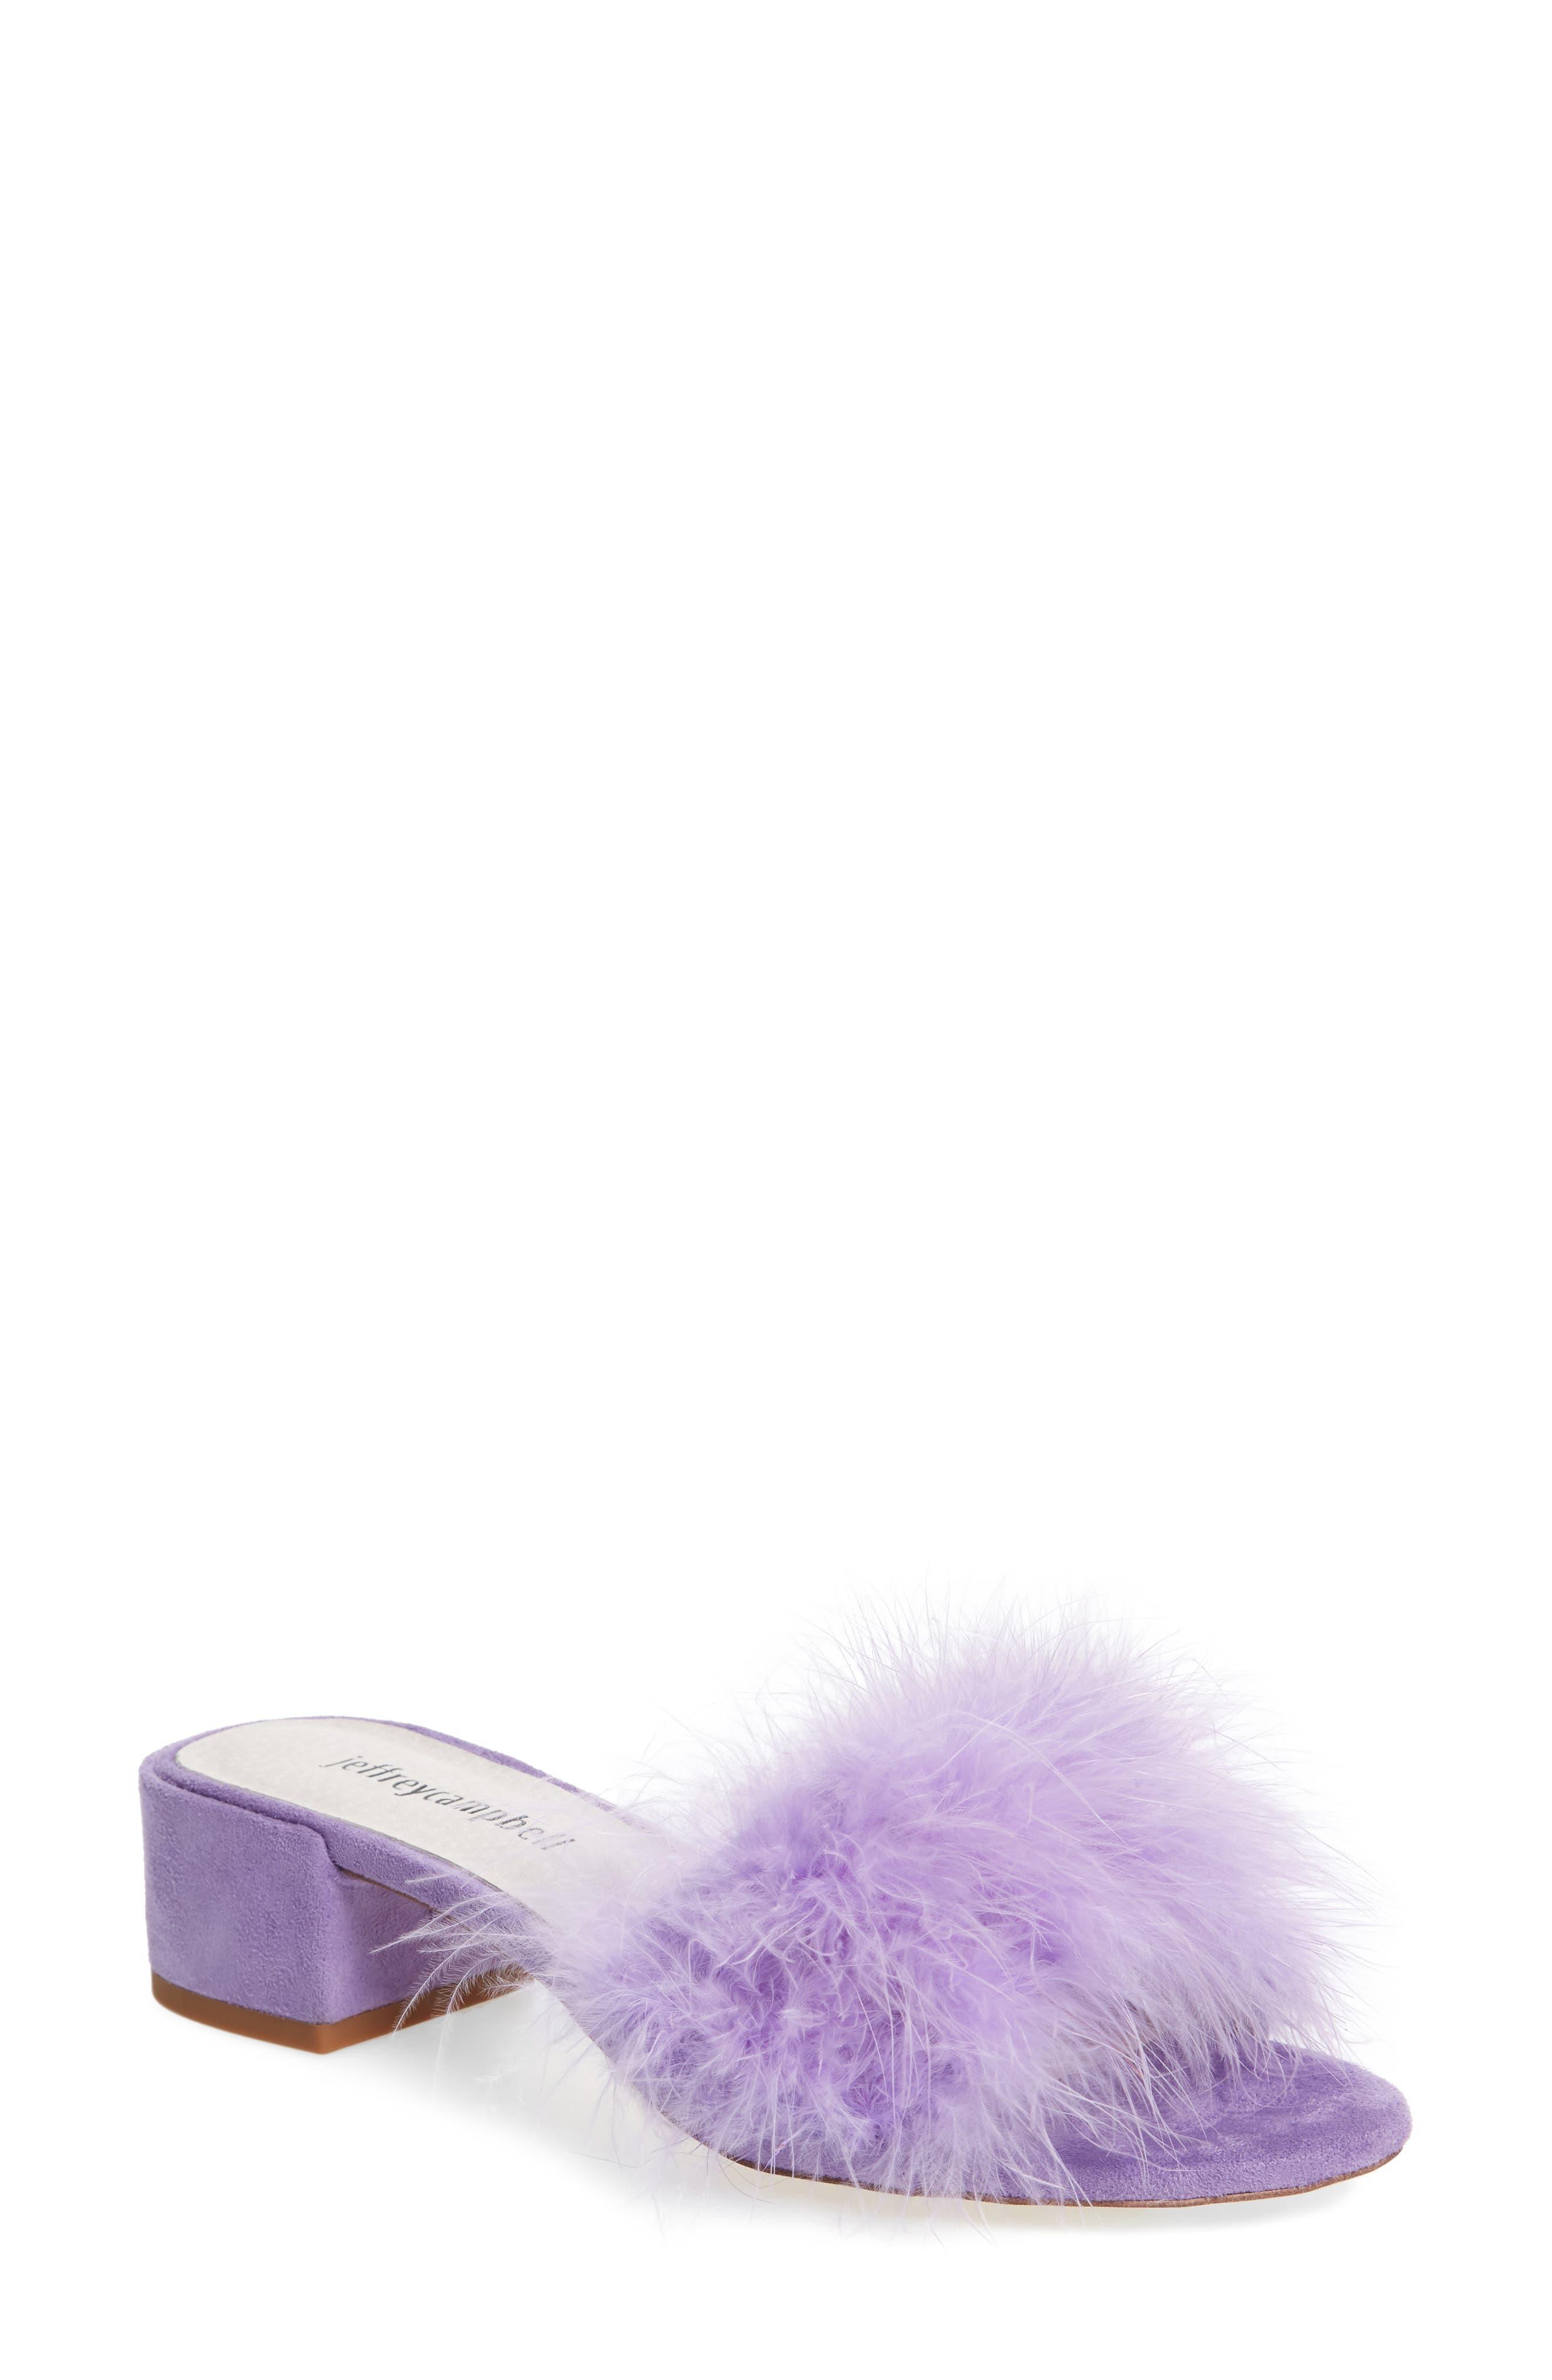 Alternate Image 1 Selected - Jeffrey Campbell 'Beaton' Slide Sandal (Women)